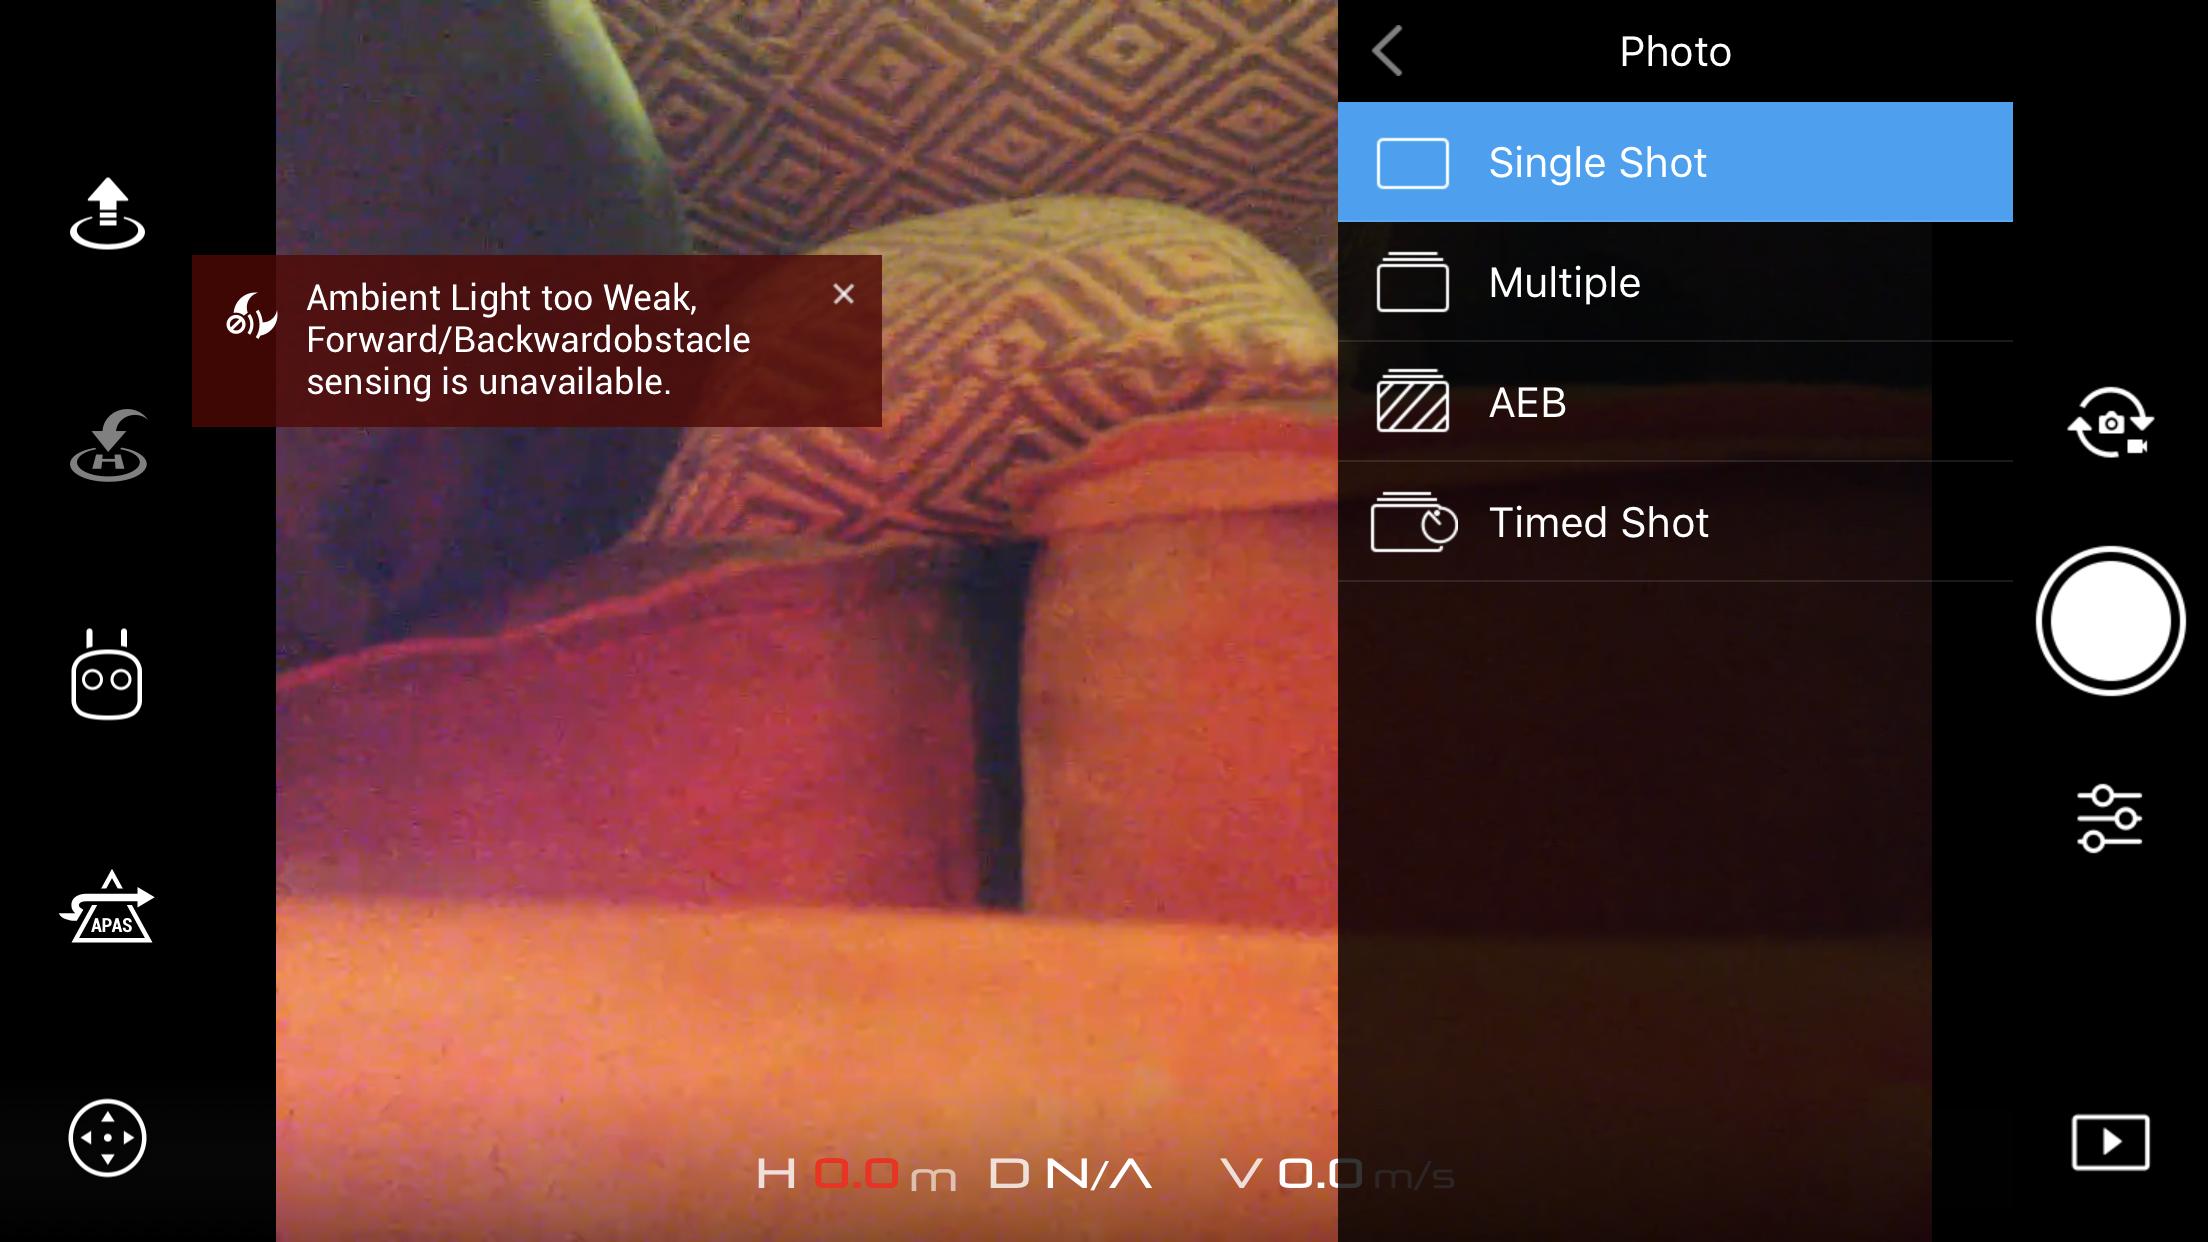 No HDR and Pano option on Mavic Air | DJI Mavic Drone Forum